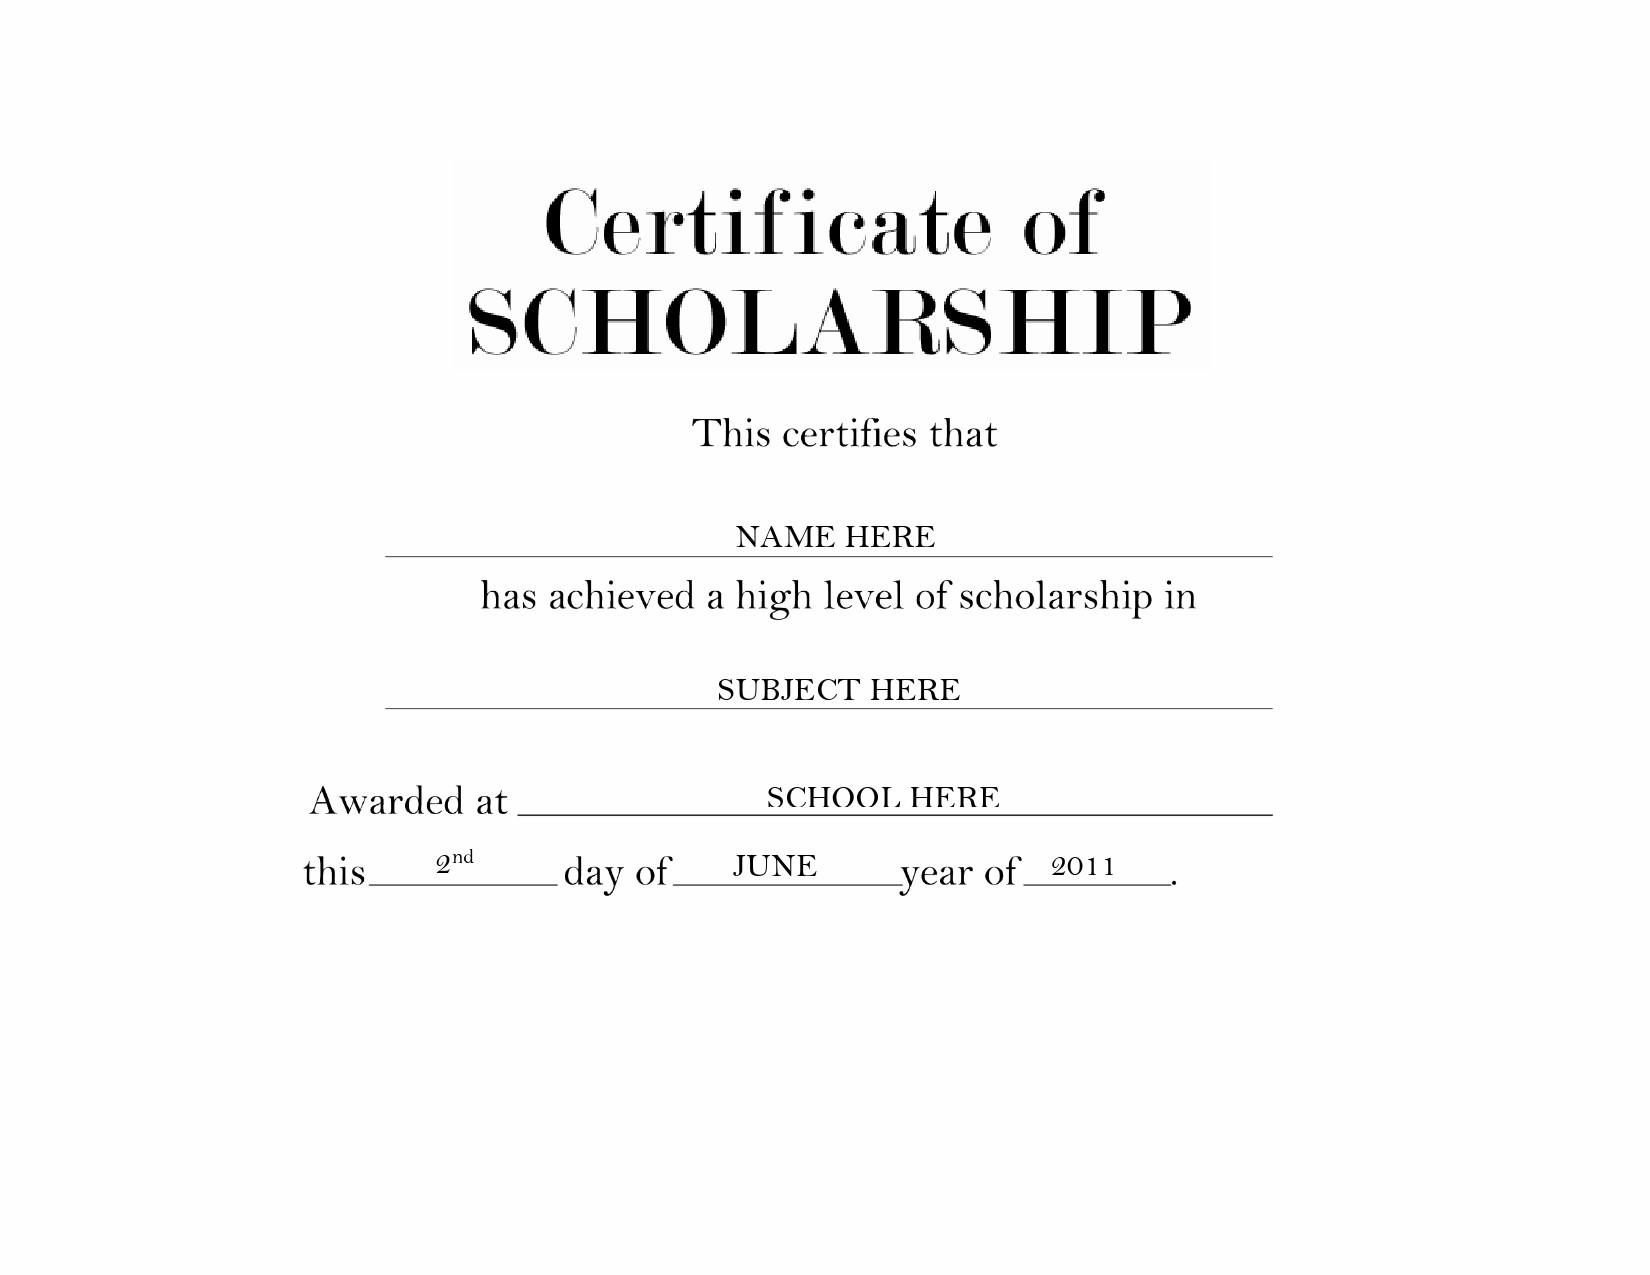 Free scholarship certificate 42